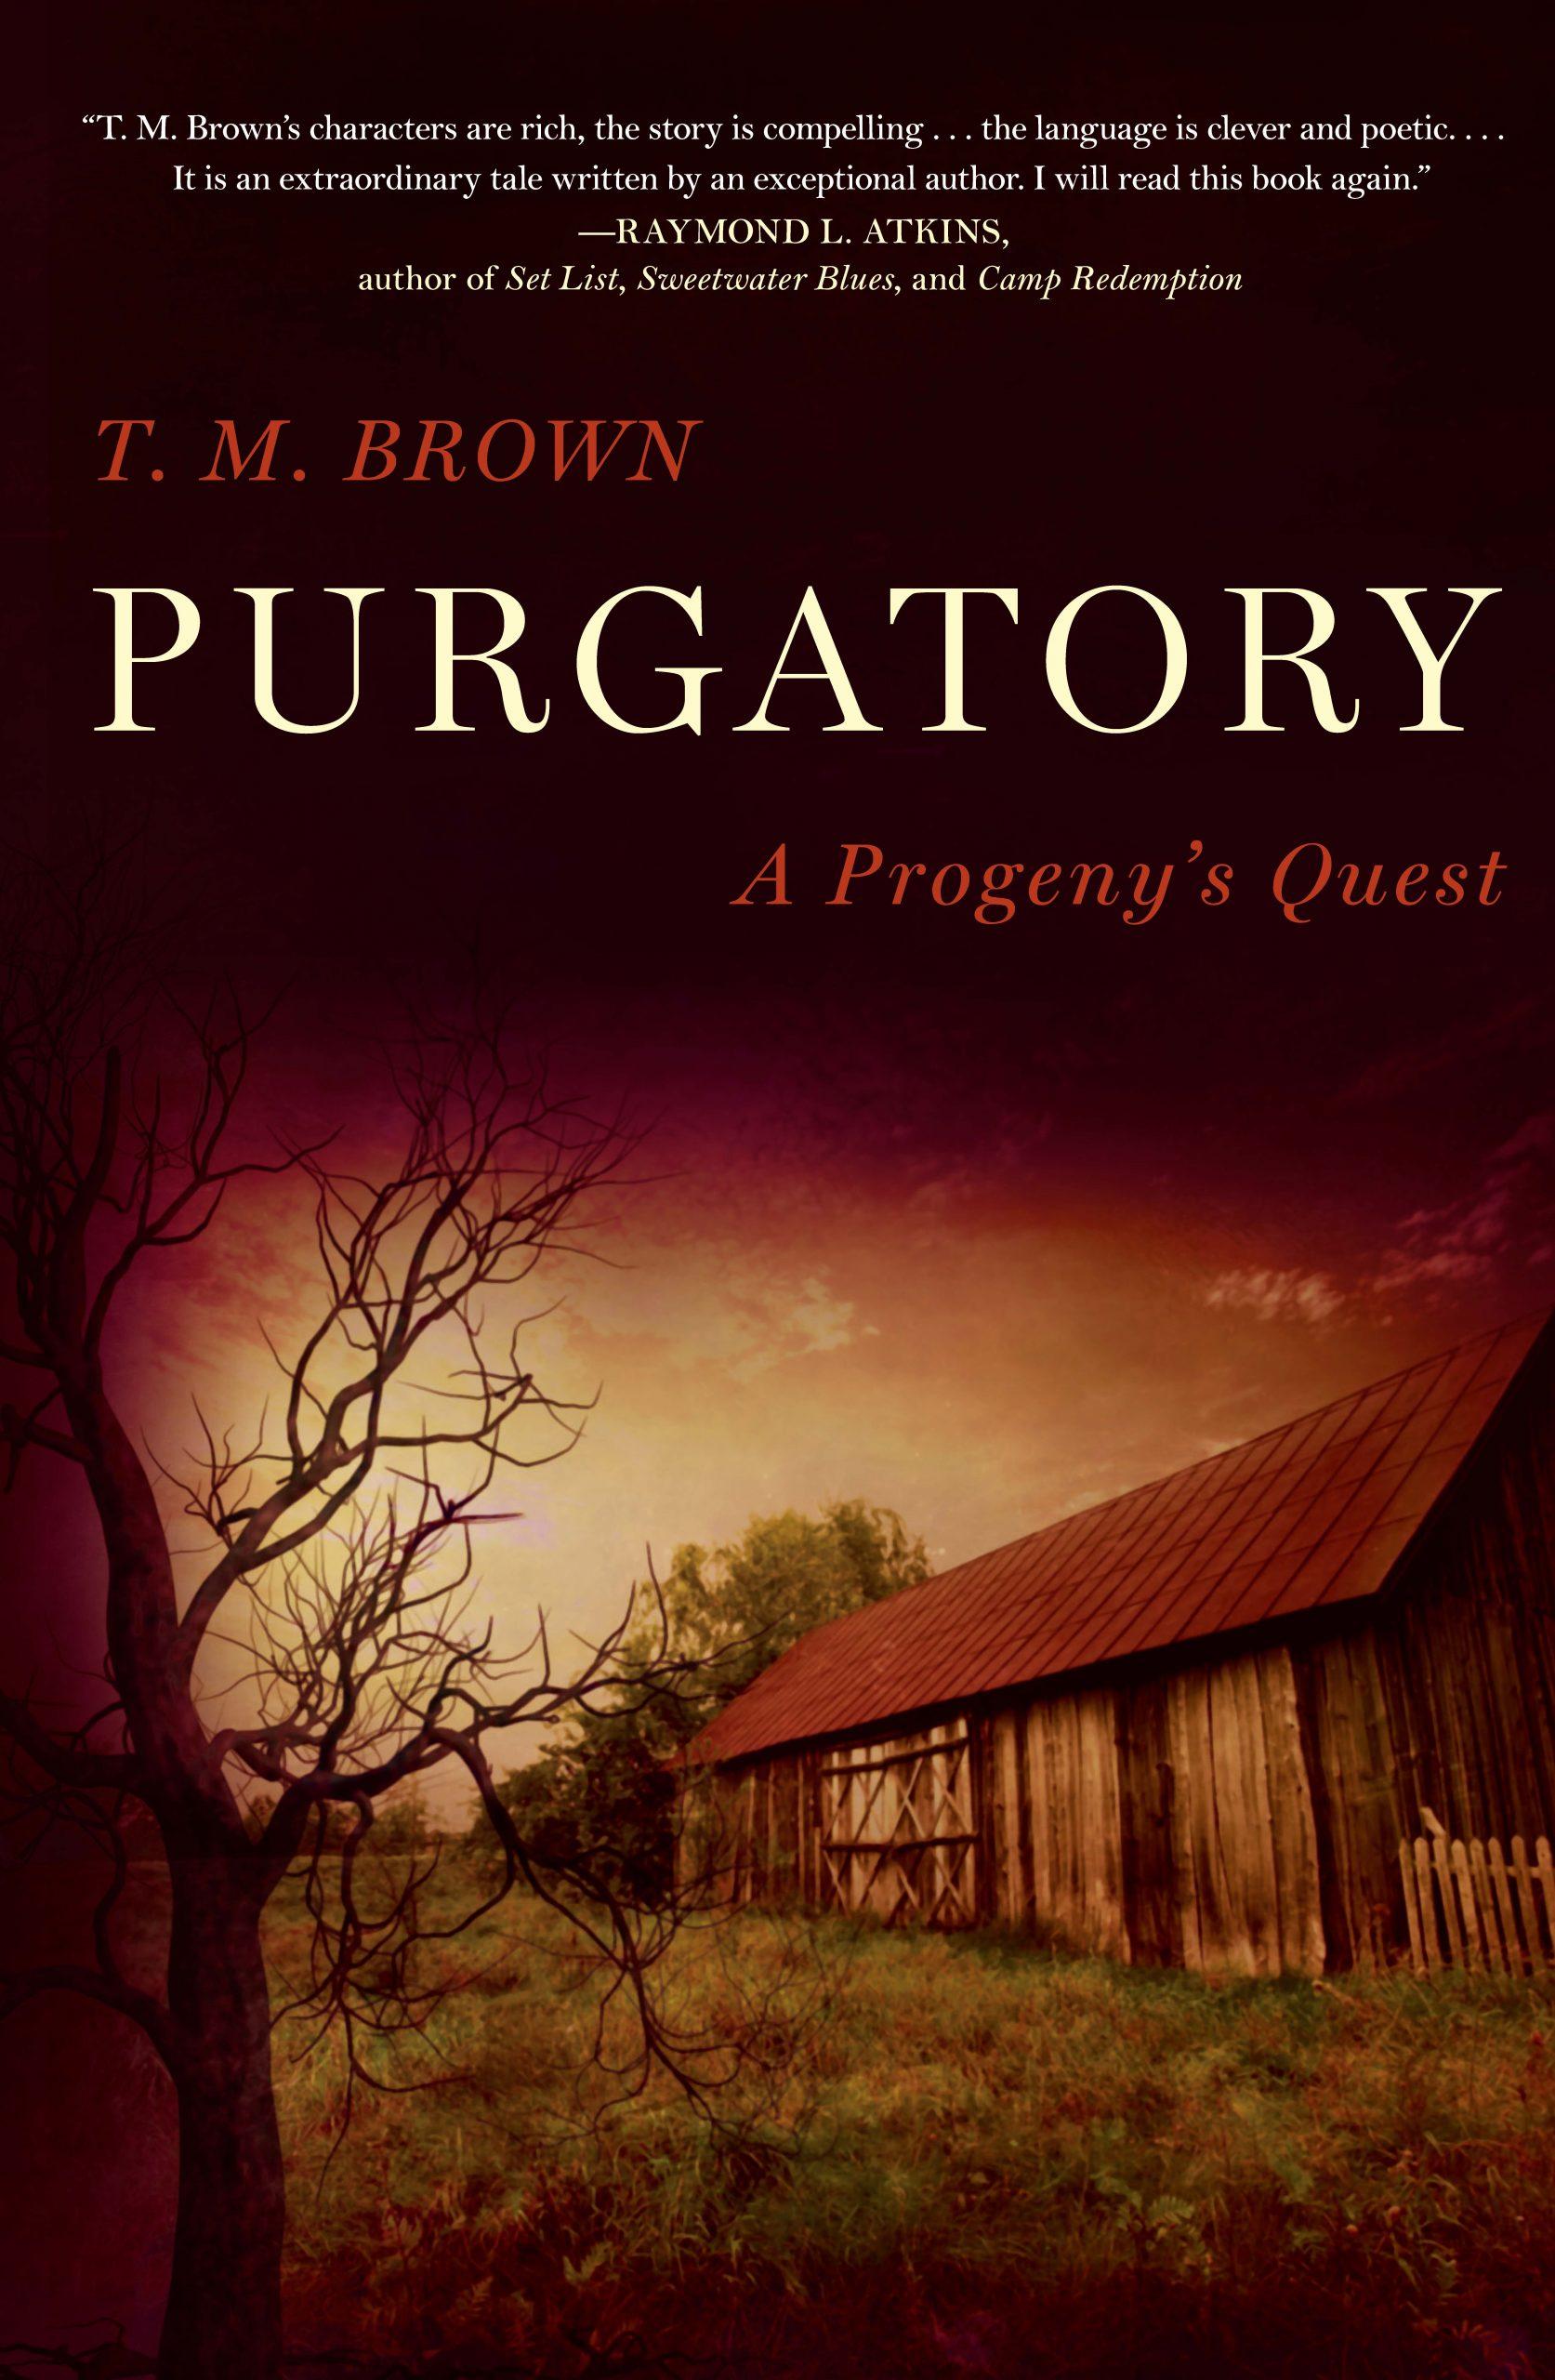 Purgatory, A Progeny's Quest